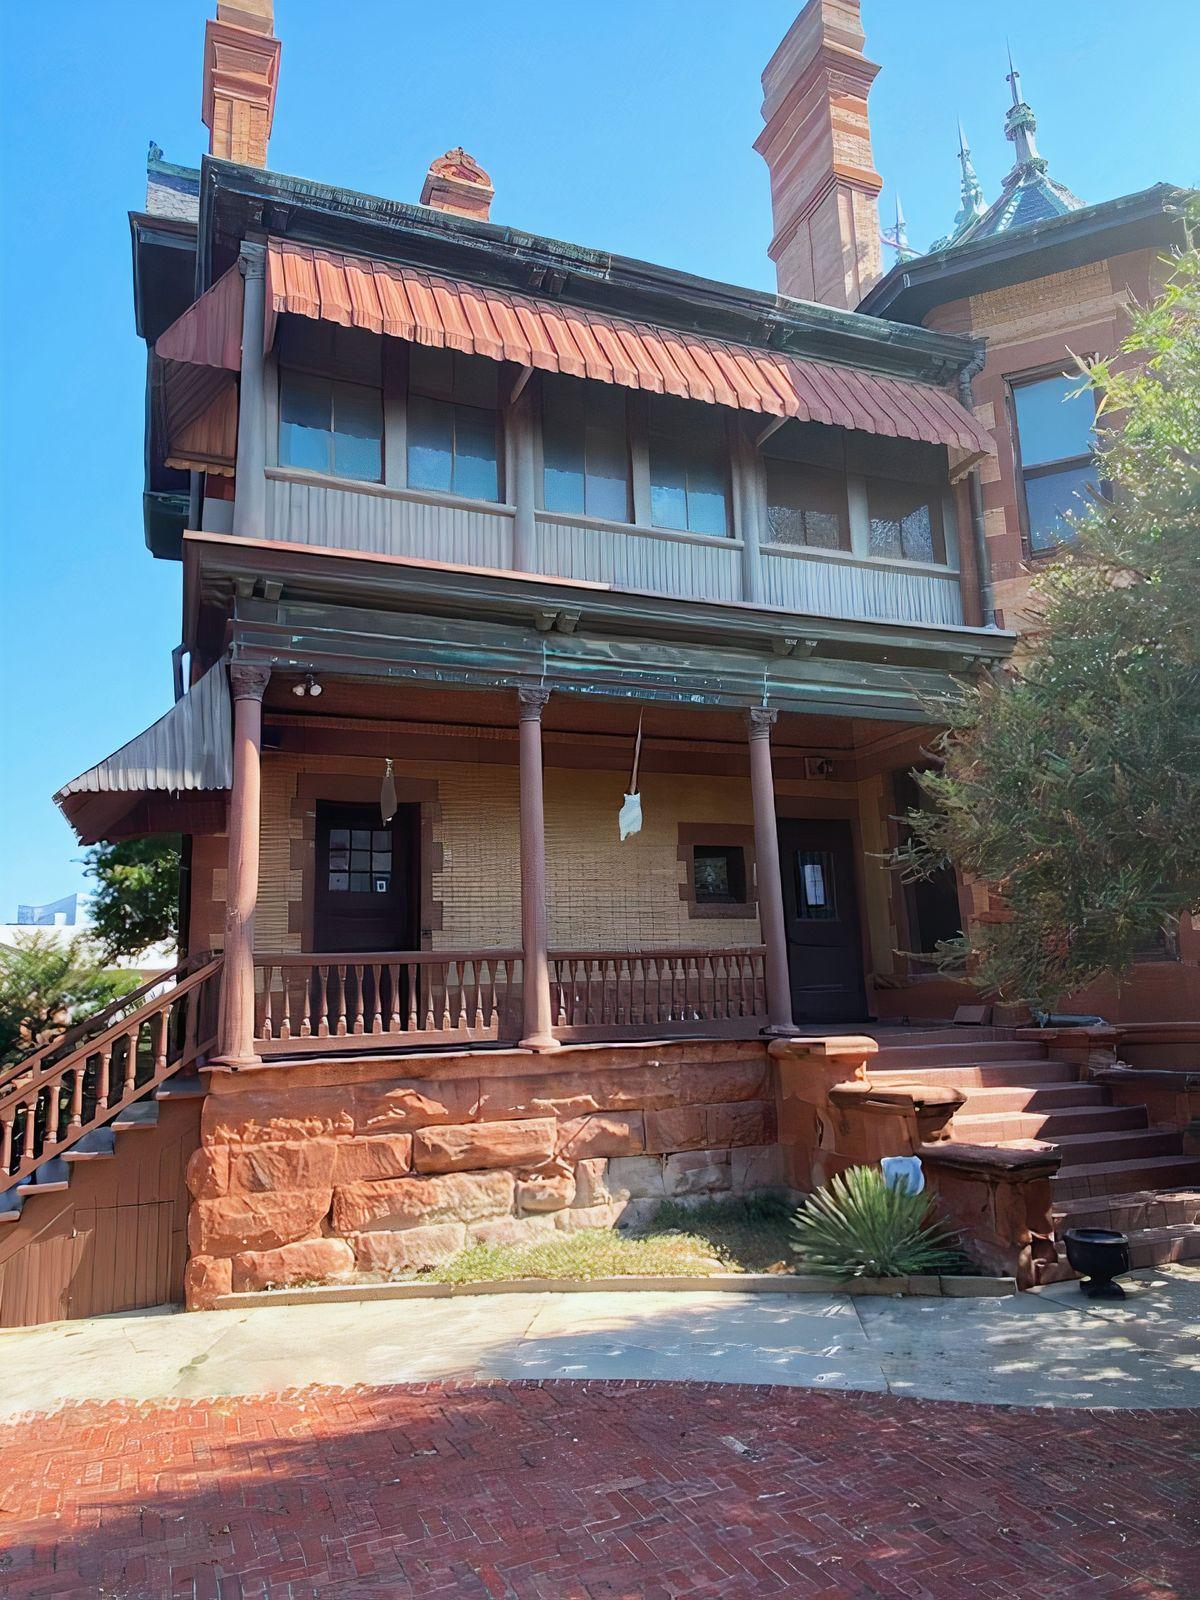 McFarland Historical Home Photo Video Shoot Location Dallas 31.jpg